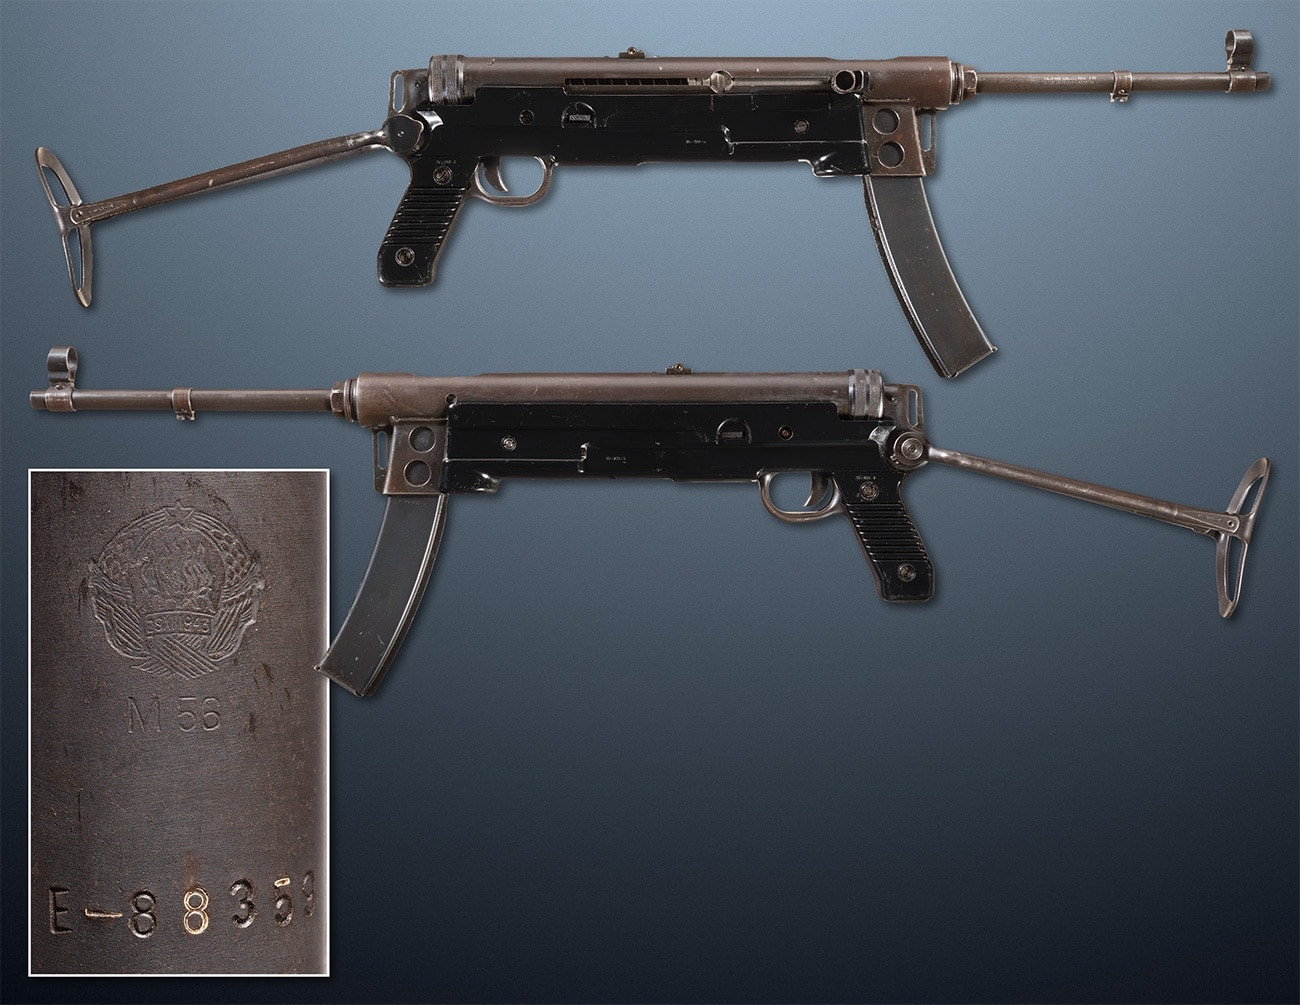 yugoslav M56 Submachine gun ria 7.62x25mm